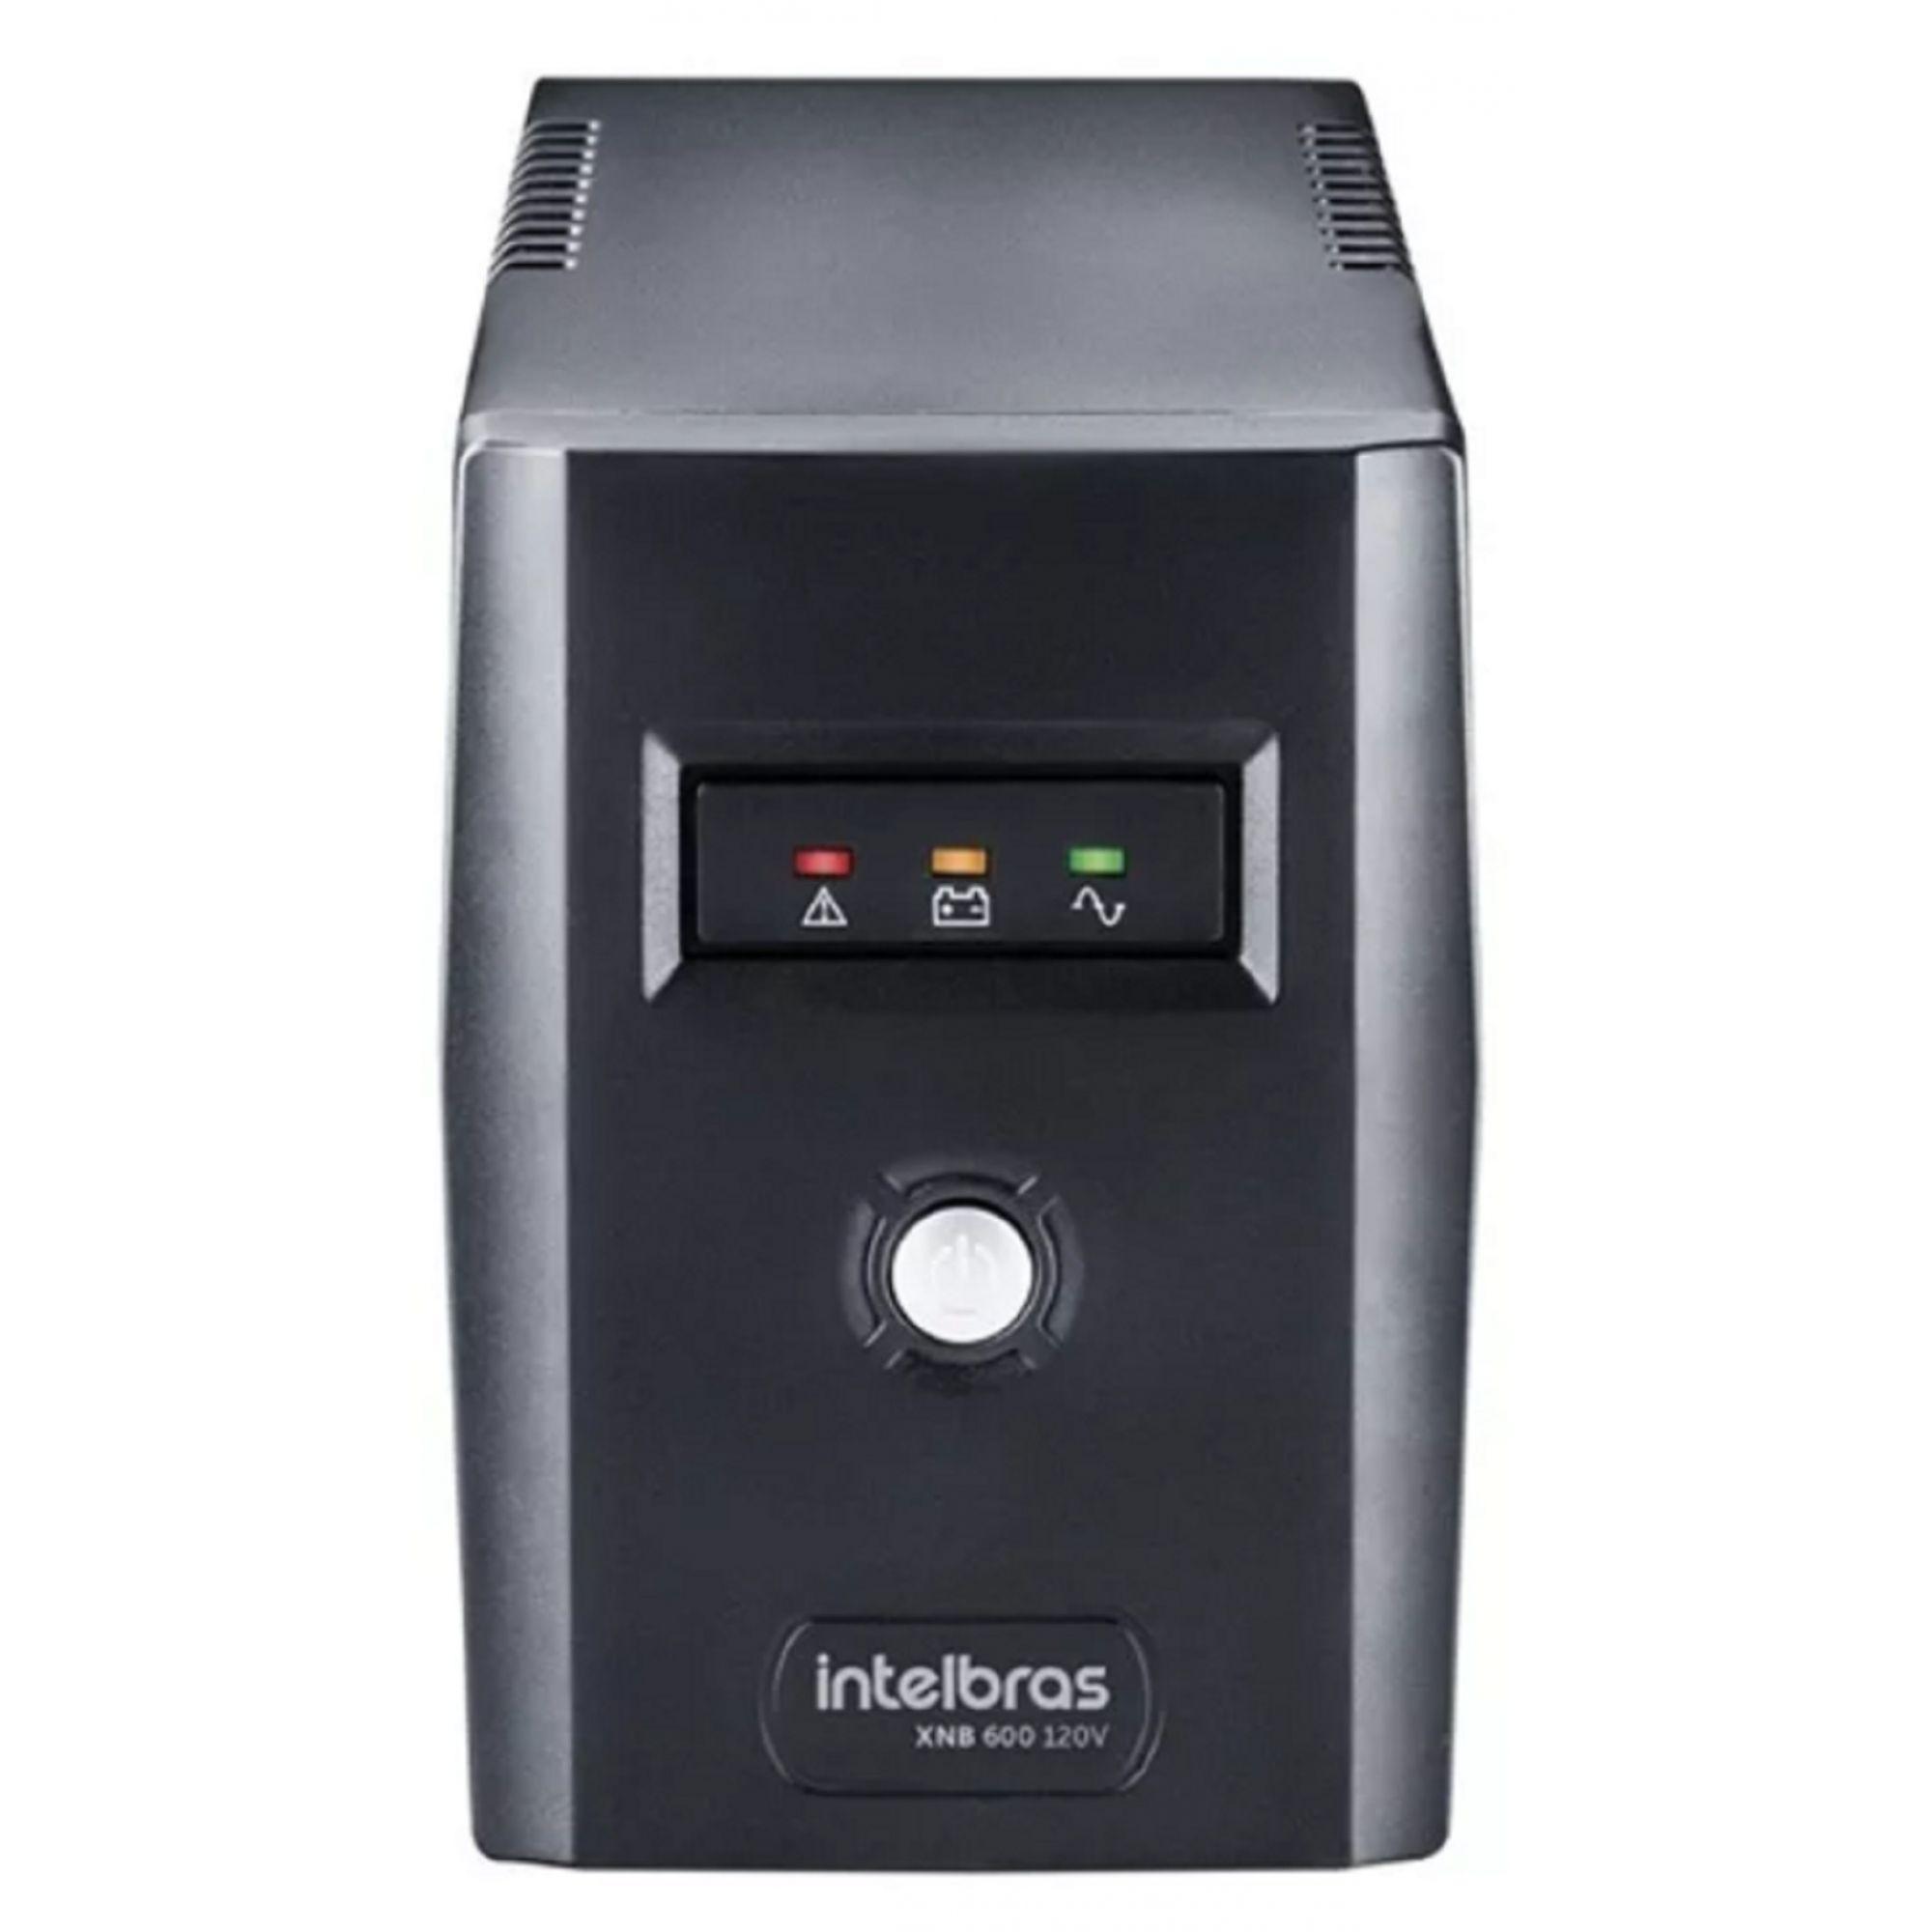 Nobreak Intelbras 600va Mono 127v Camera Vigilancia CFTV